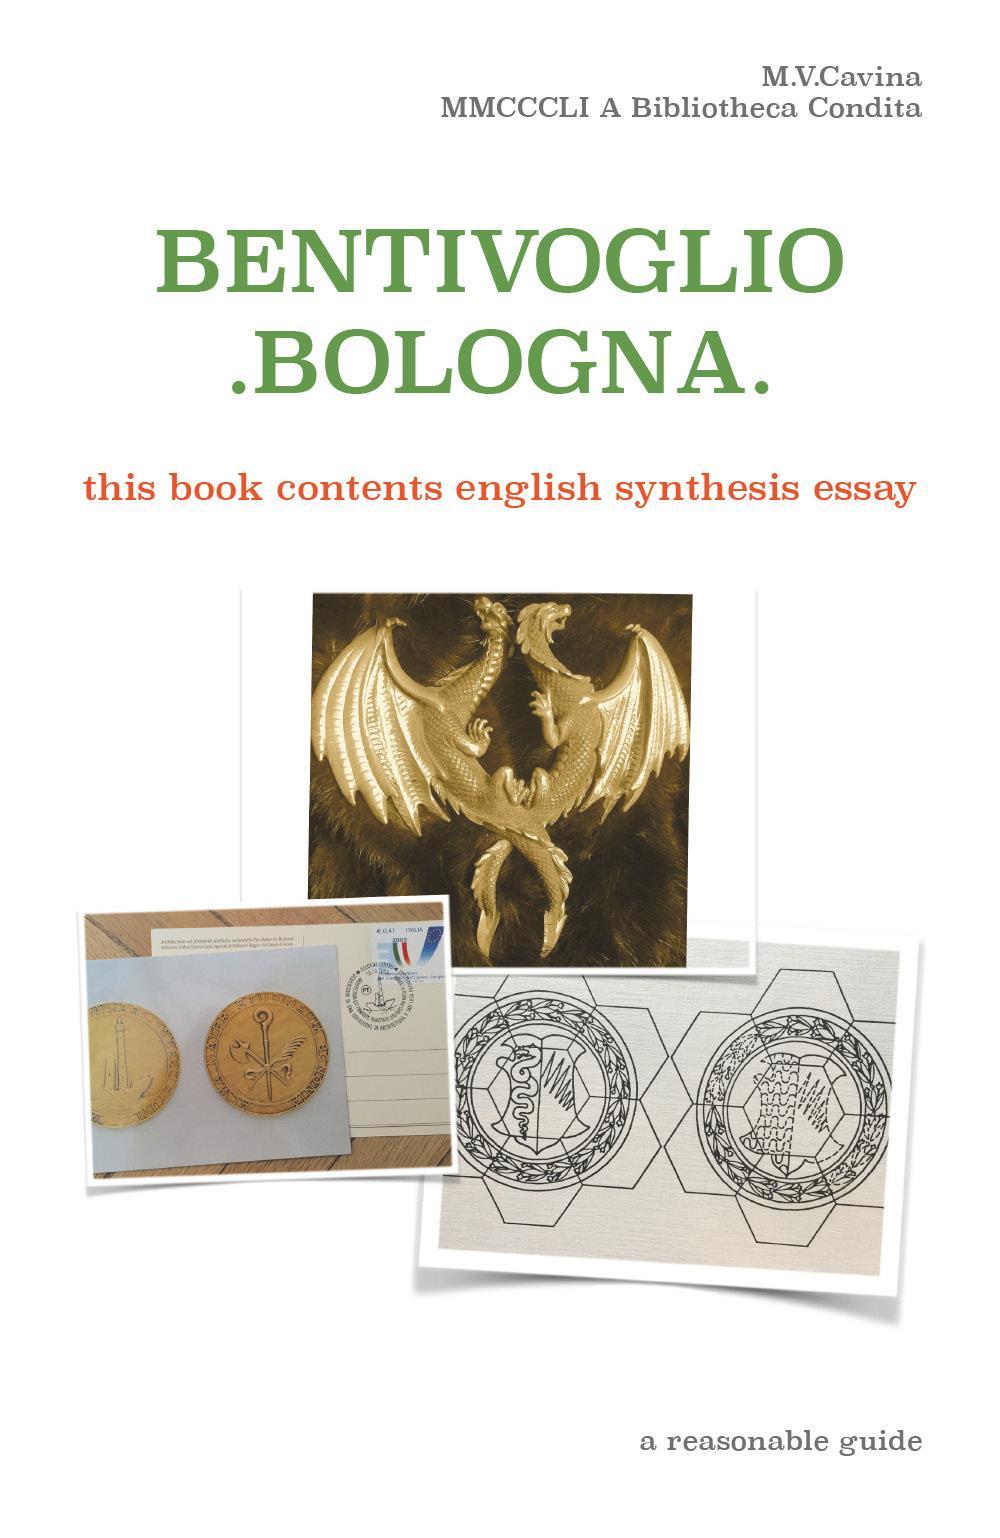 Bentivoglio Bologna